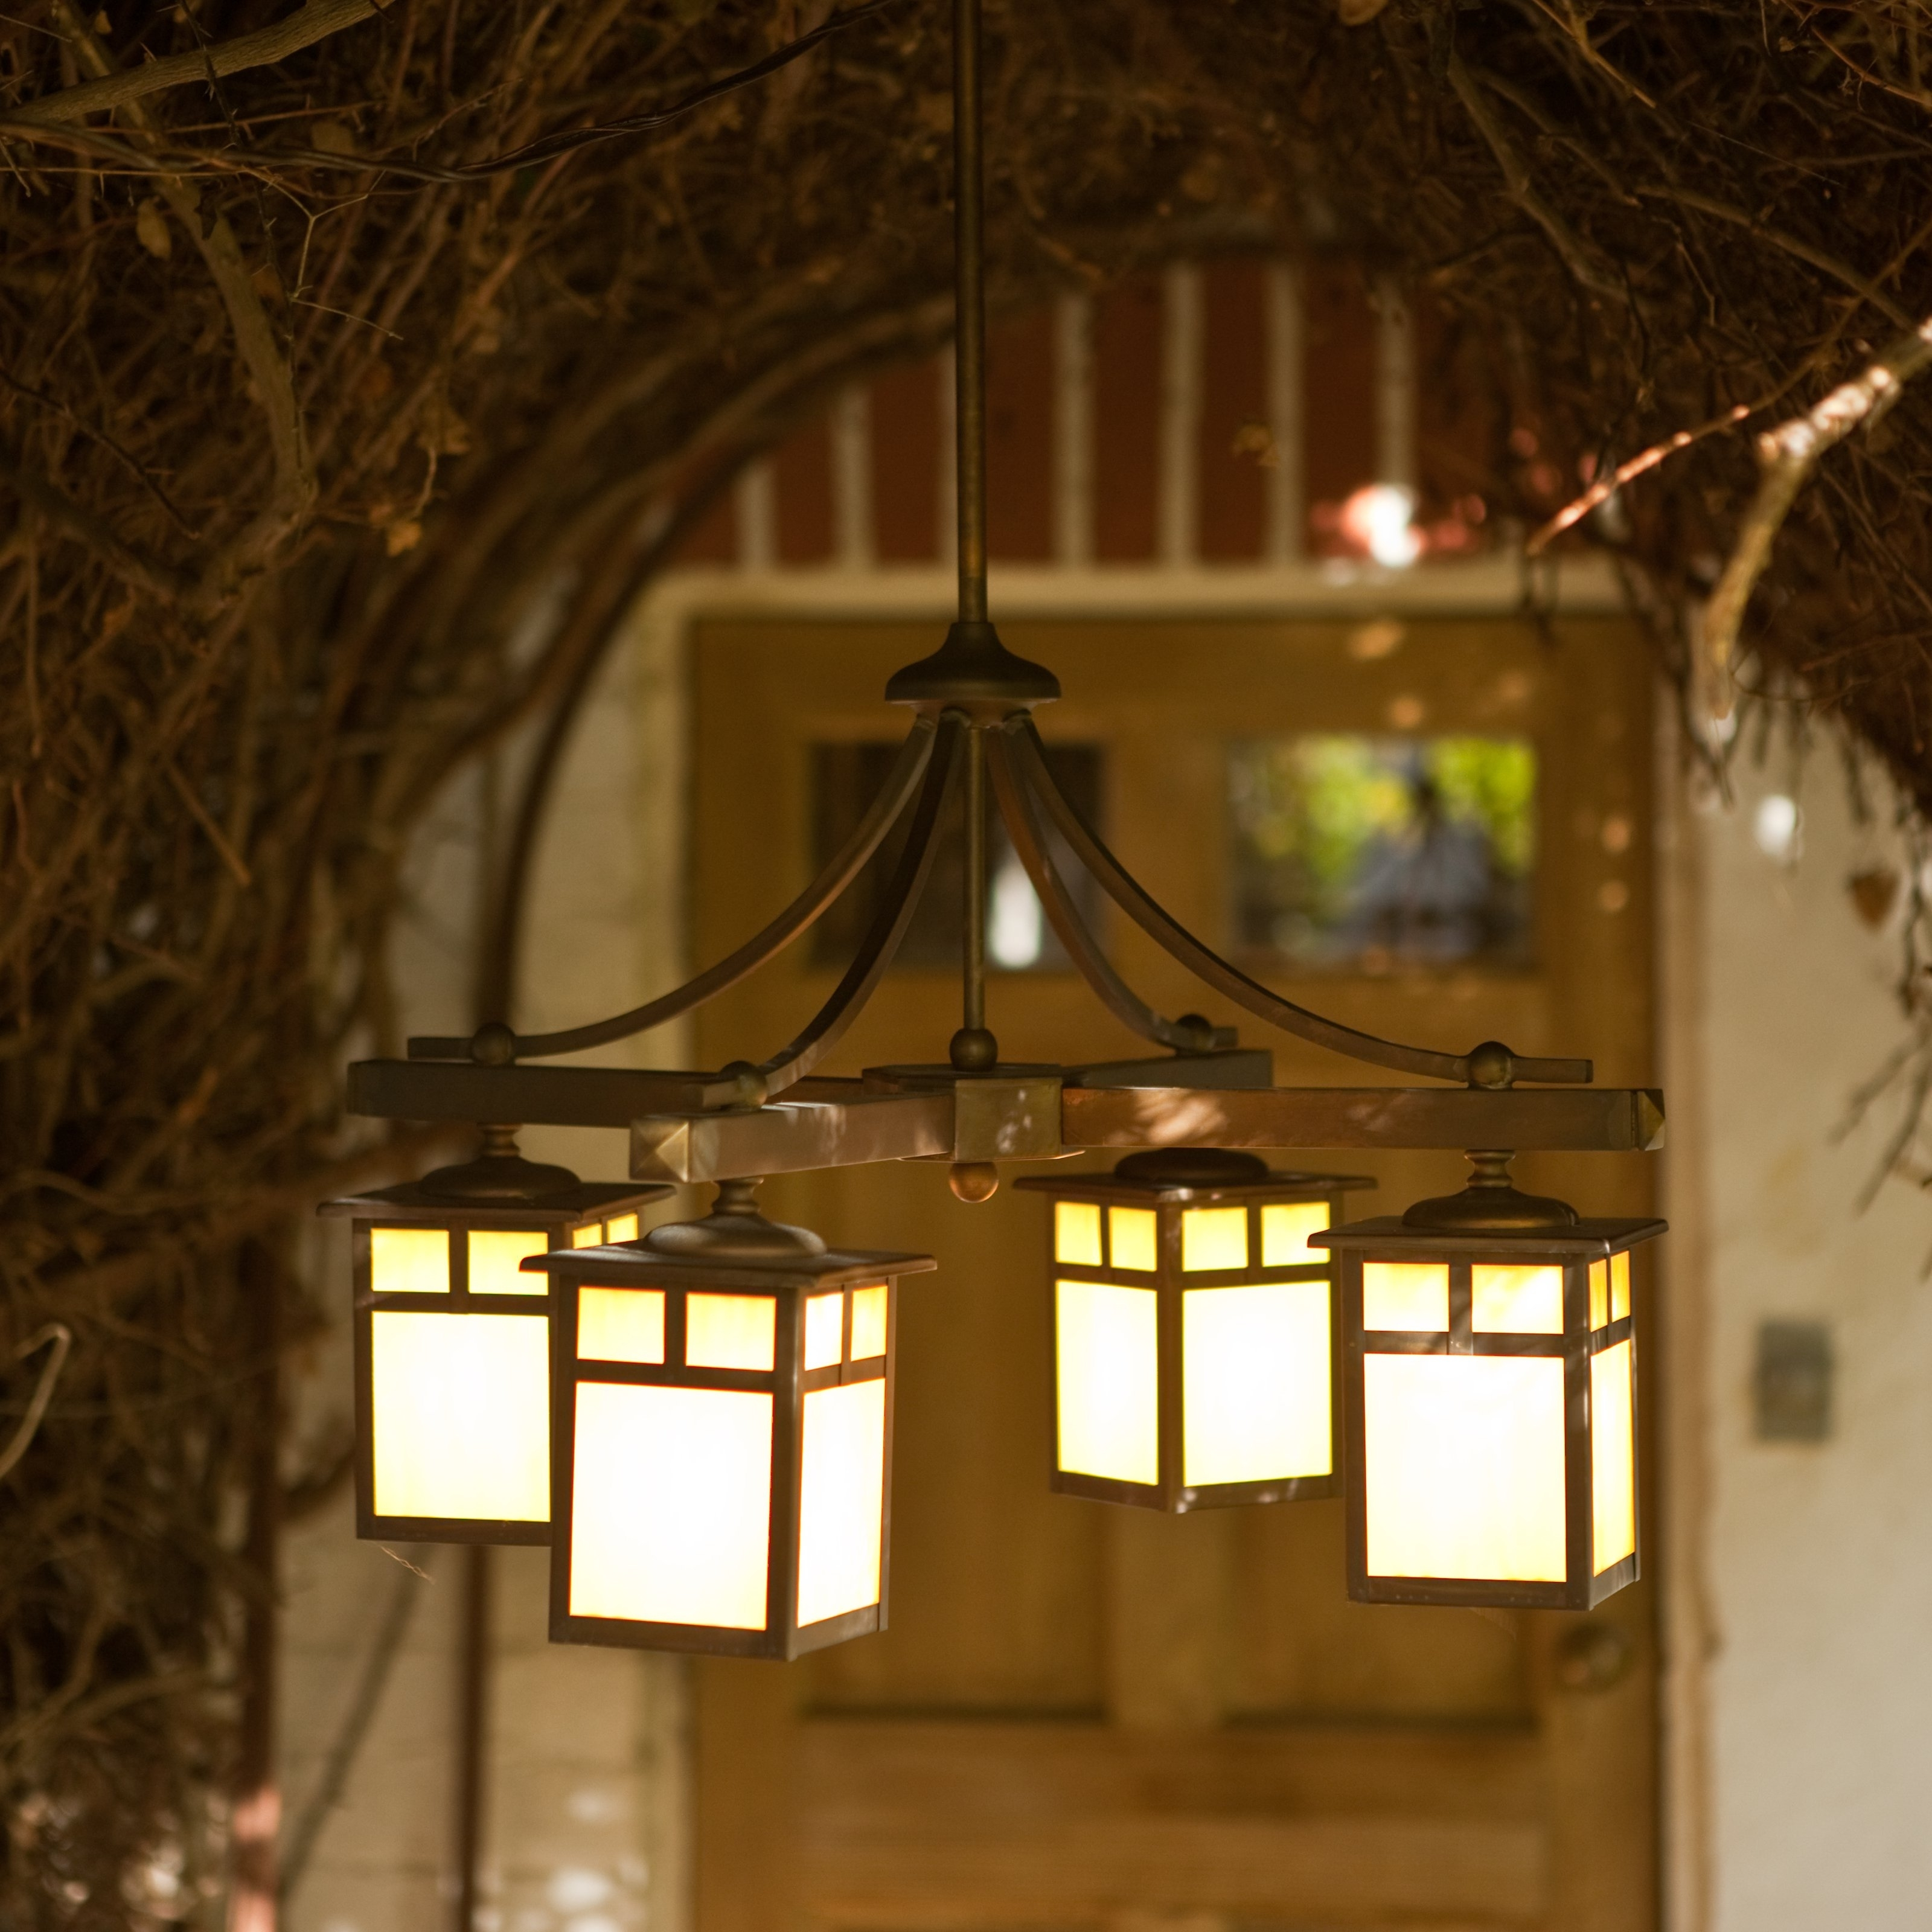 Outdoor Hanging Lights | Hayneedle For Outdoor Hanging Lights (#11 of 15)